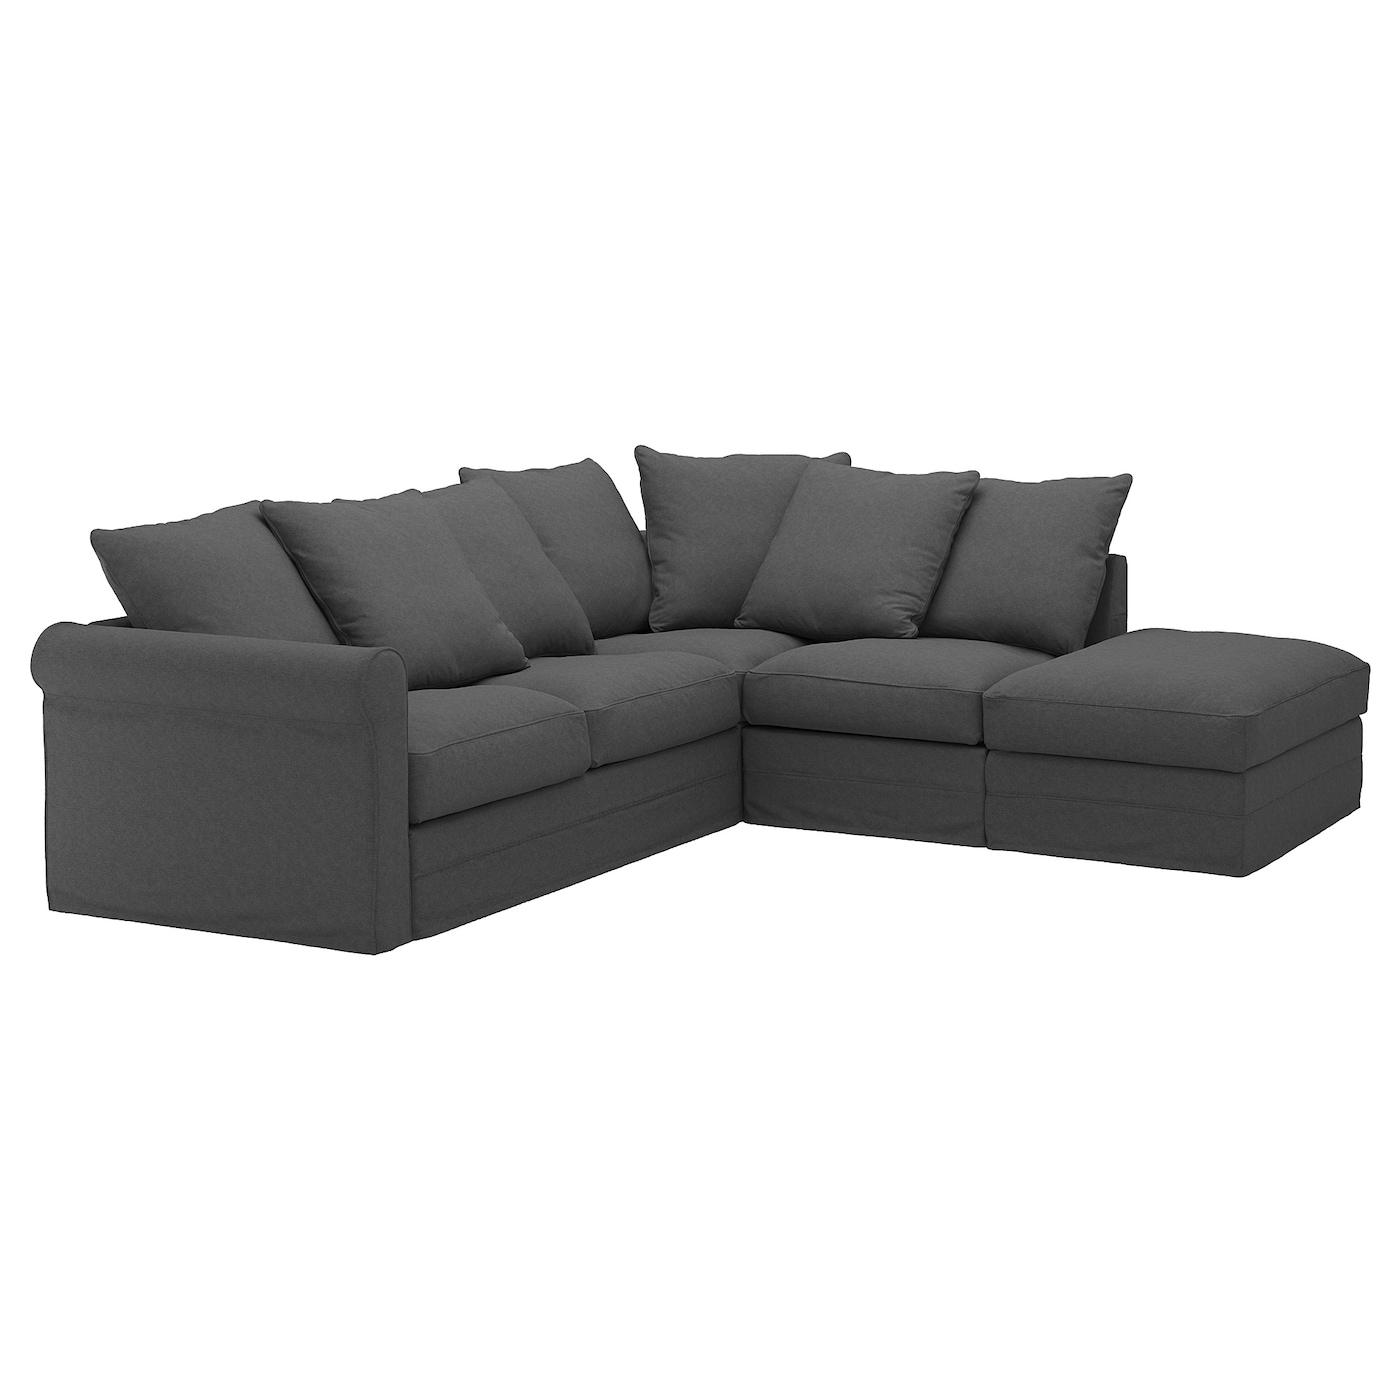 Charcoal Grey Fabric 2C3 Chesterfield Nelson Corner Sofa